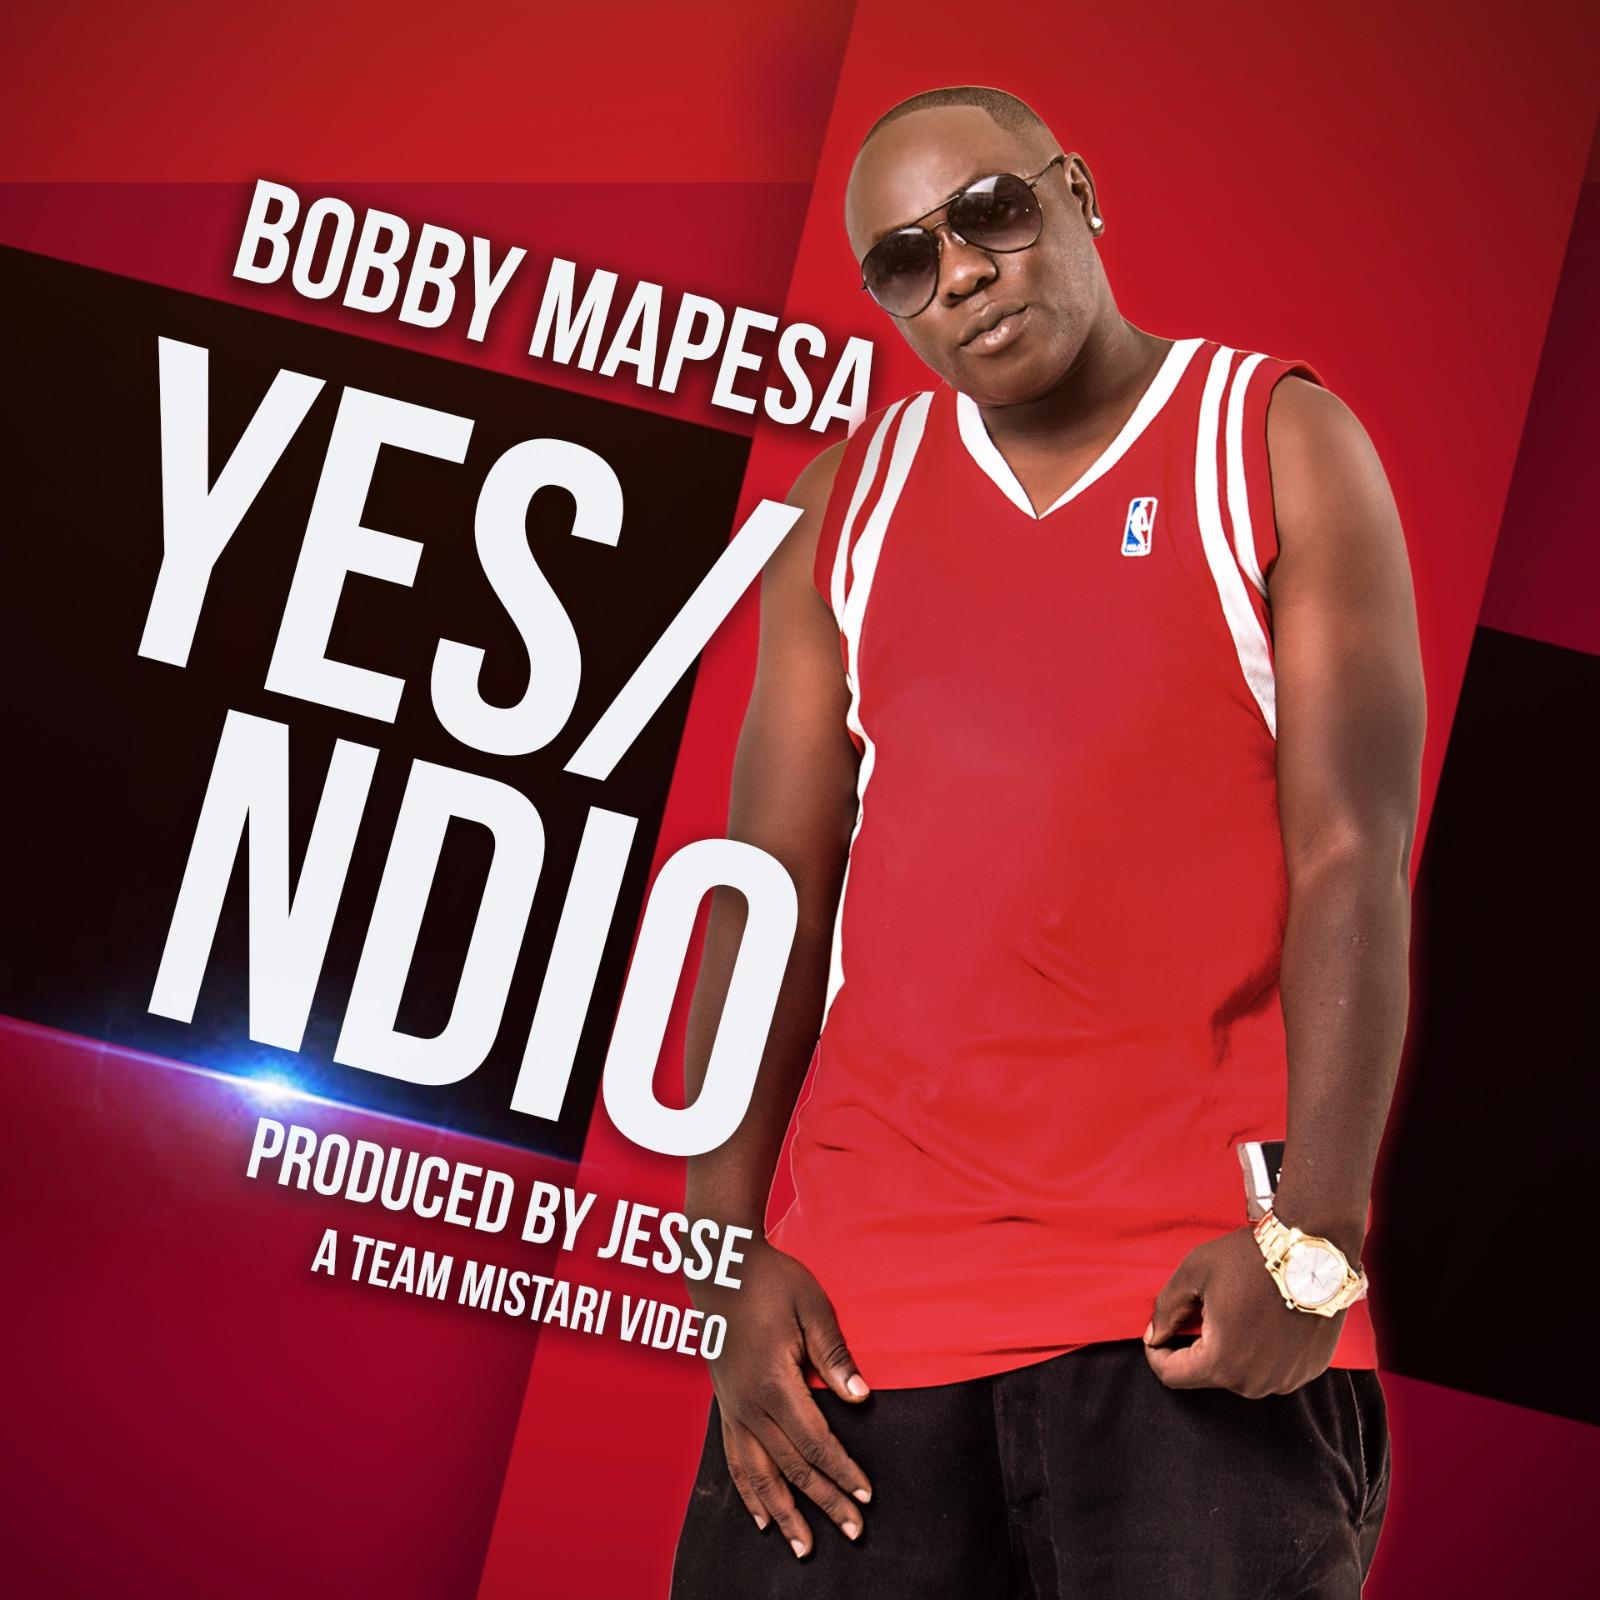 Bobby Mapesa Yes Ndio Artwork